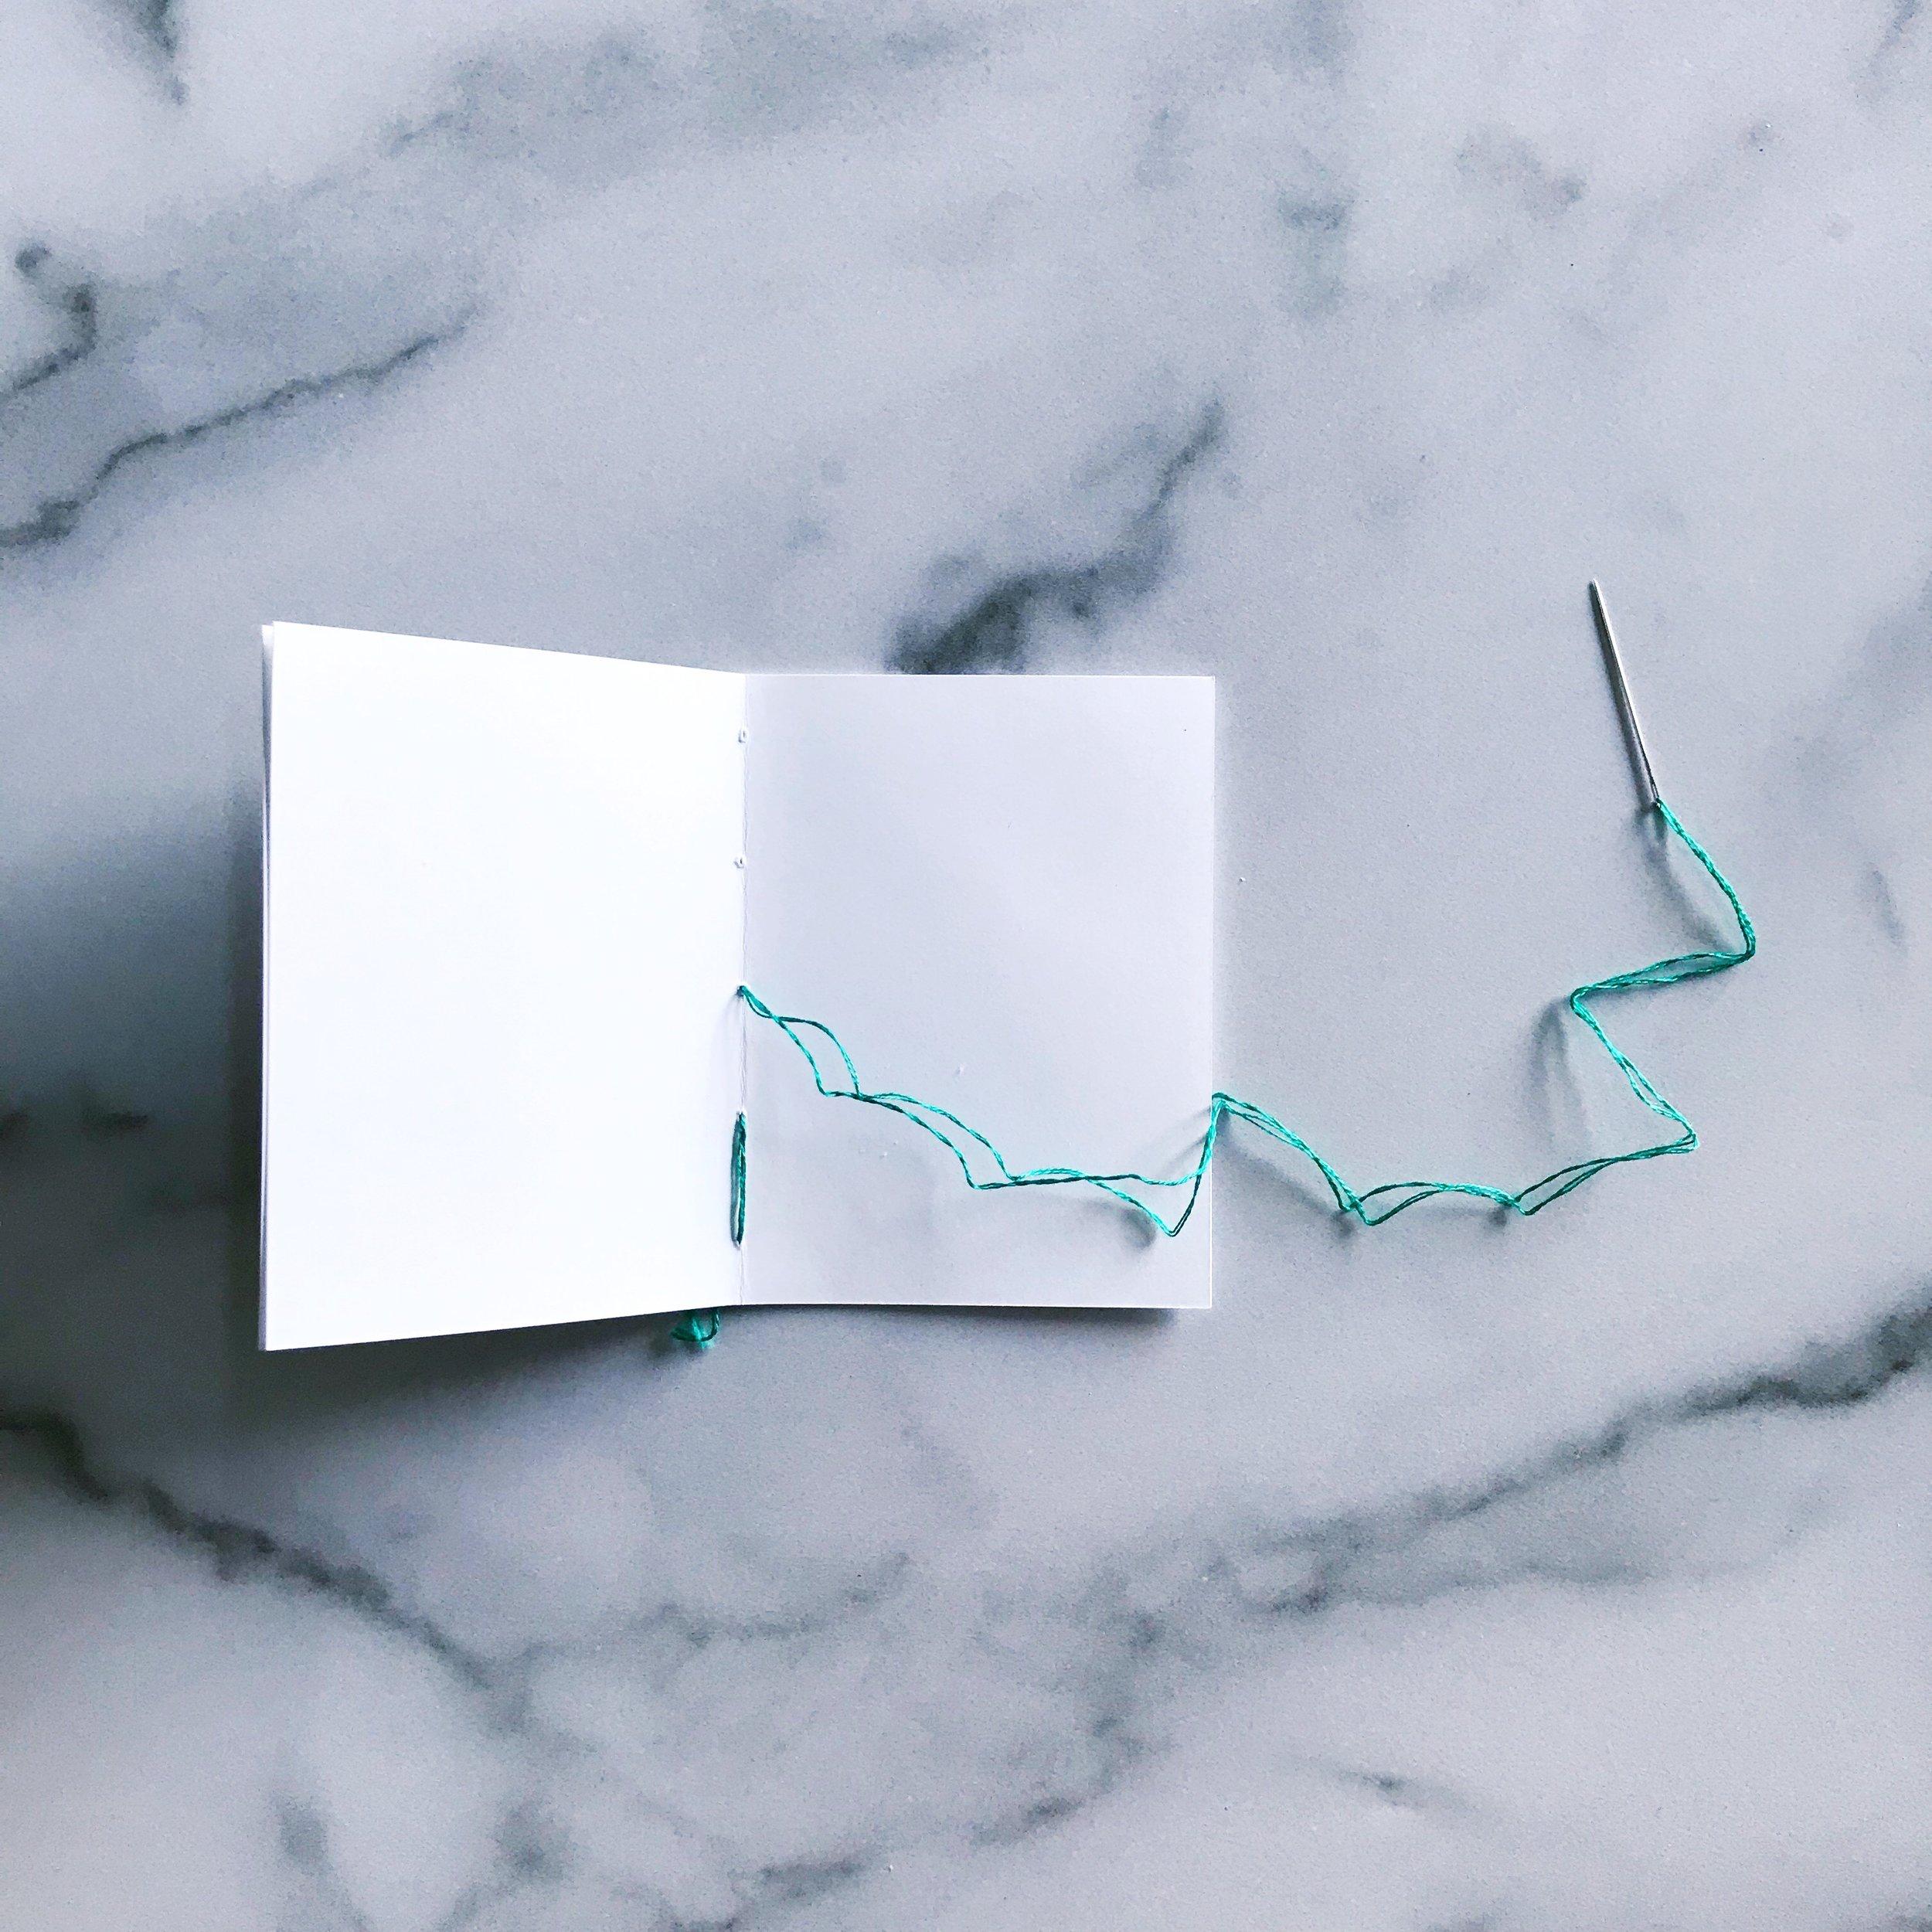 papercraftpantry-blog-do-it-yourself-scrapbook.jpg